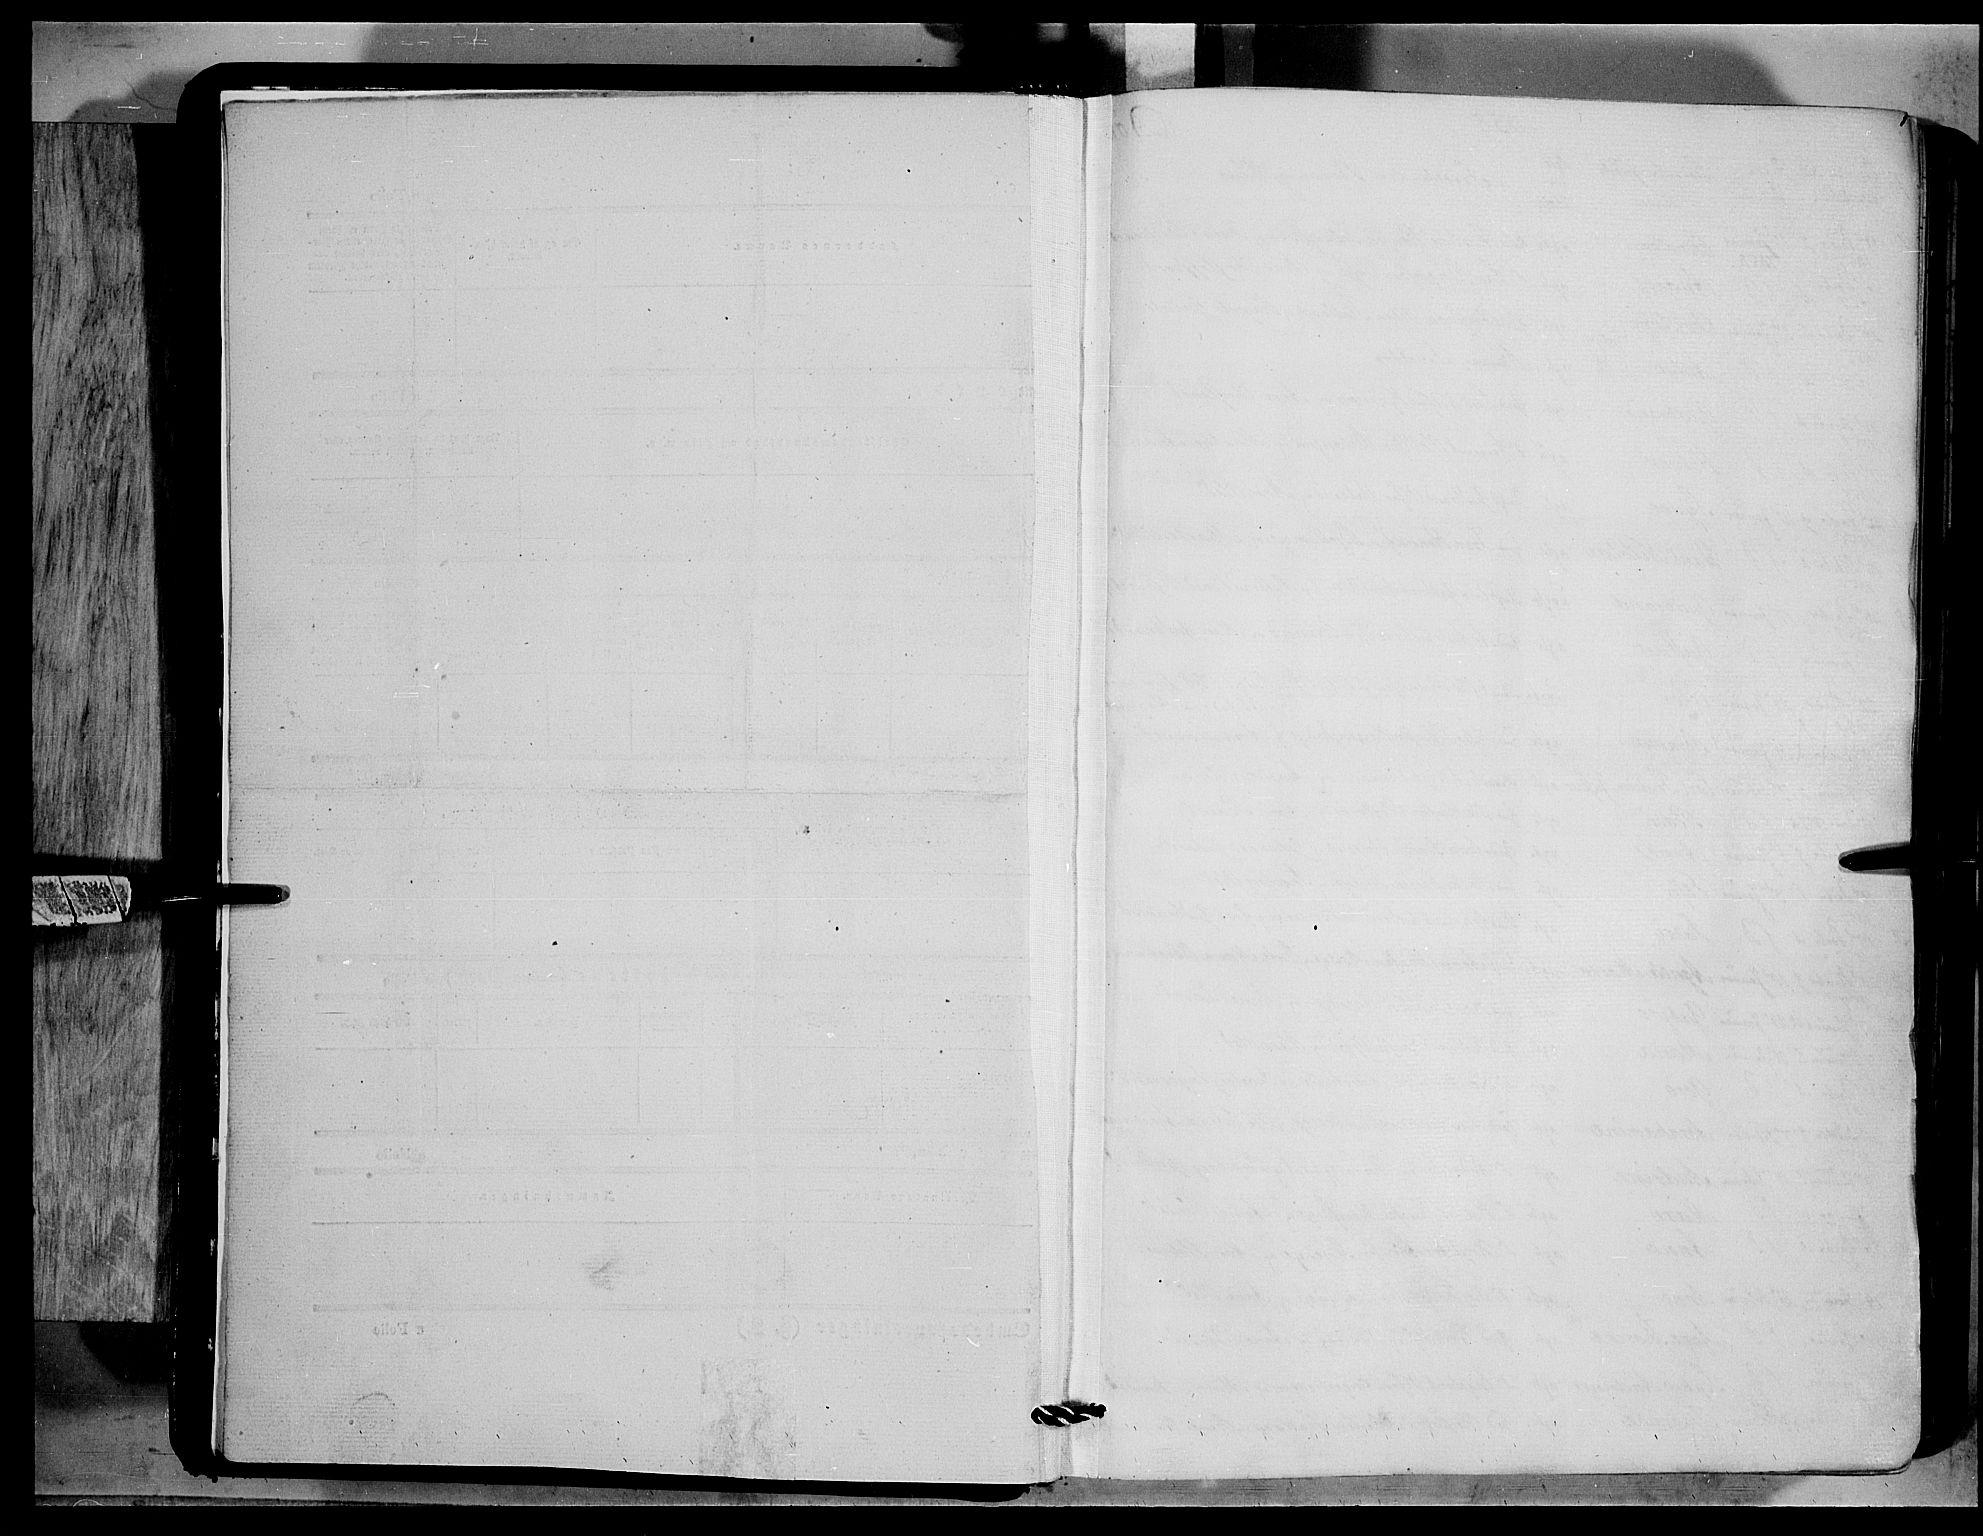 SAH, Jevnaker prestekontor, Ministerialbok nr. 7, 1858-1876, s. 1